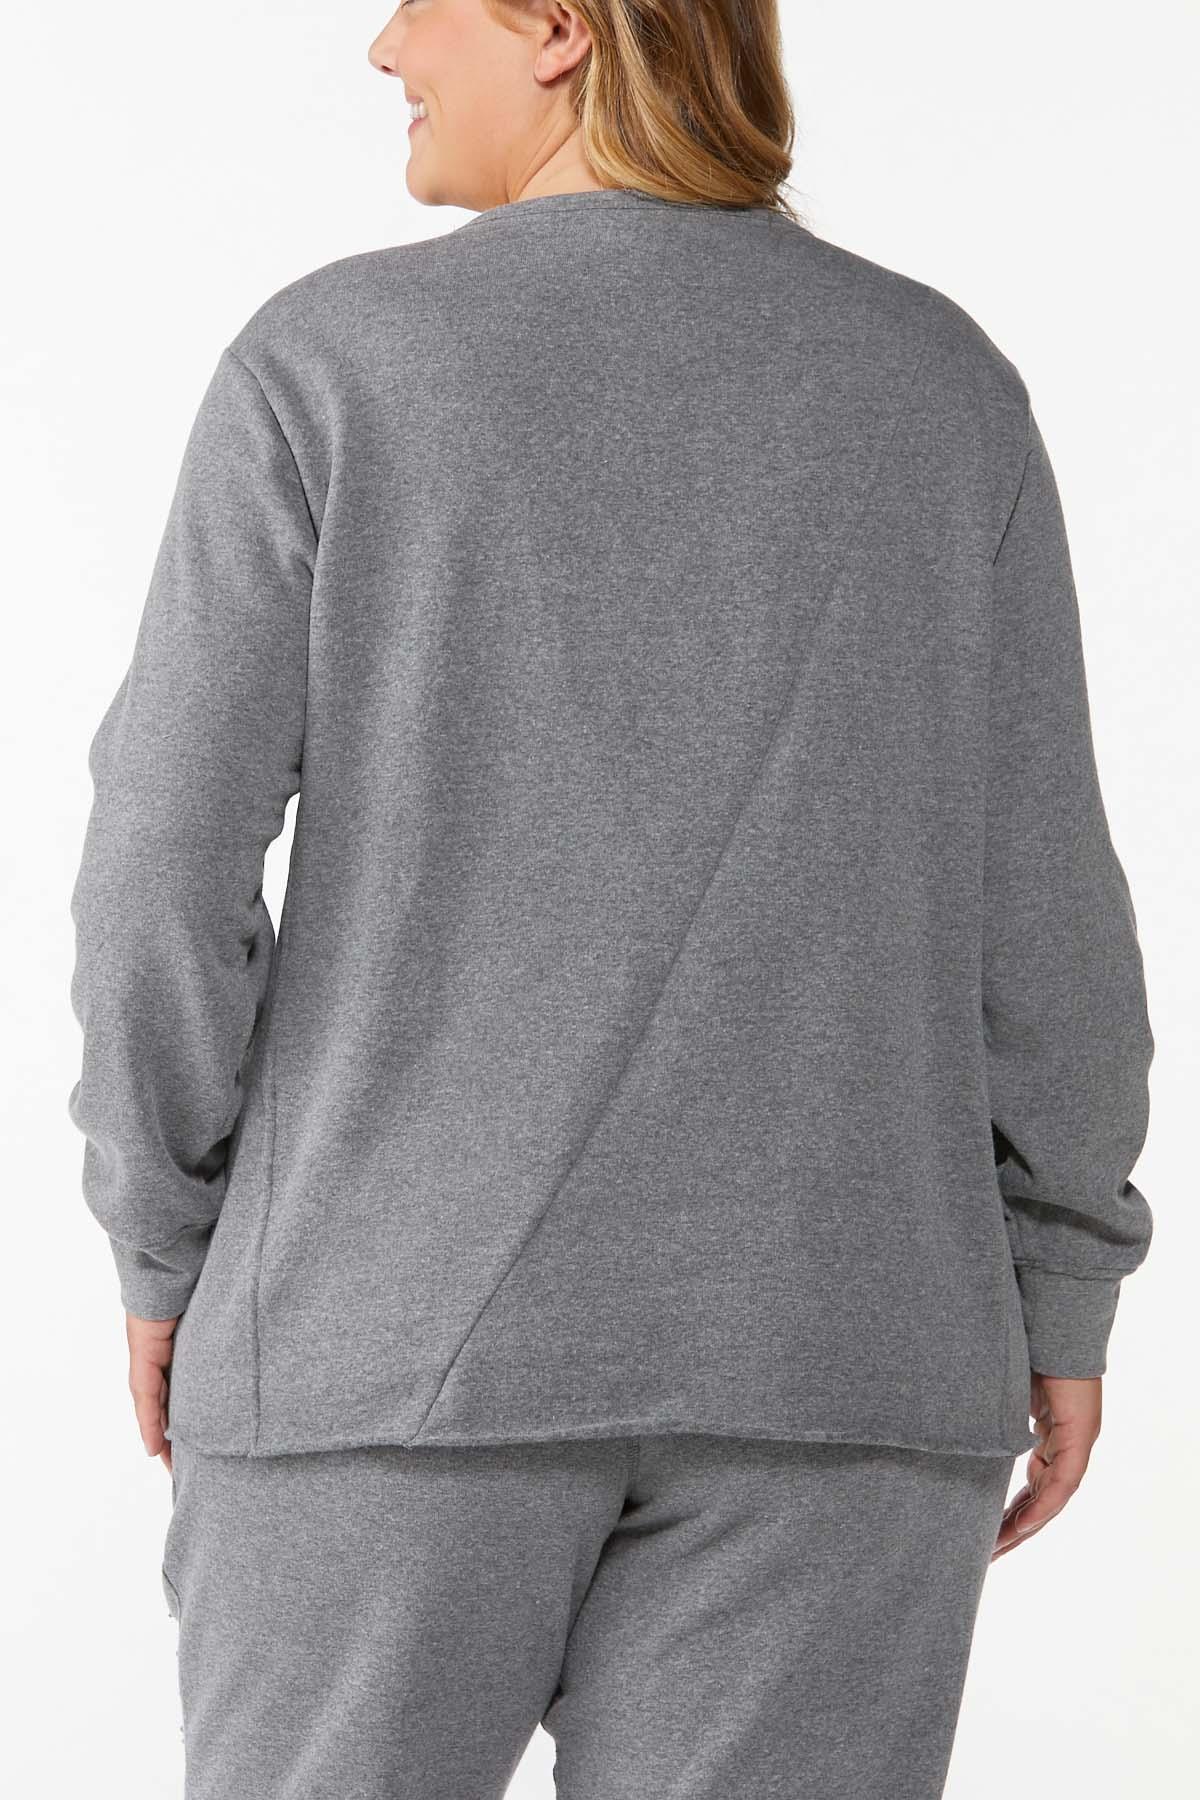 Plus Size Distressed Sweatshirt (Item #44712288)